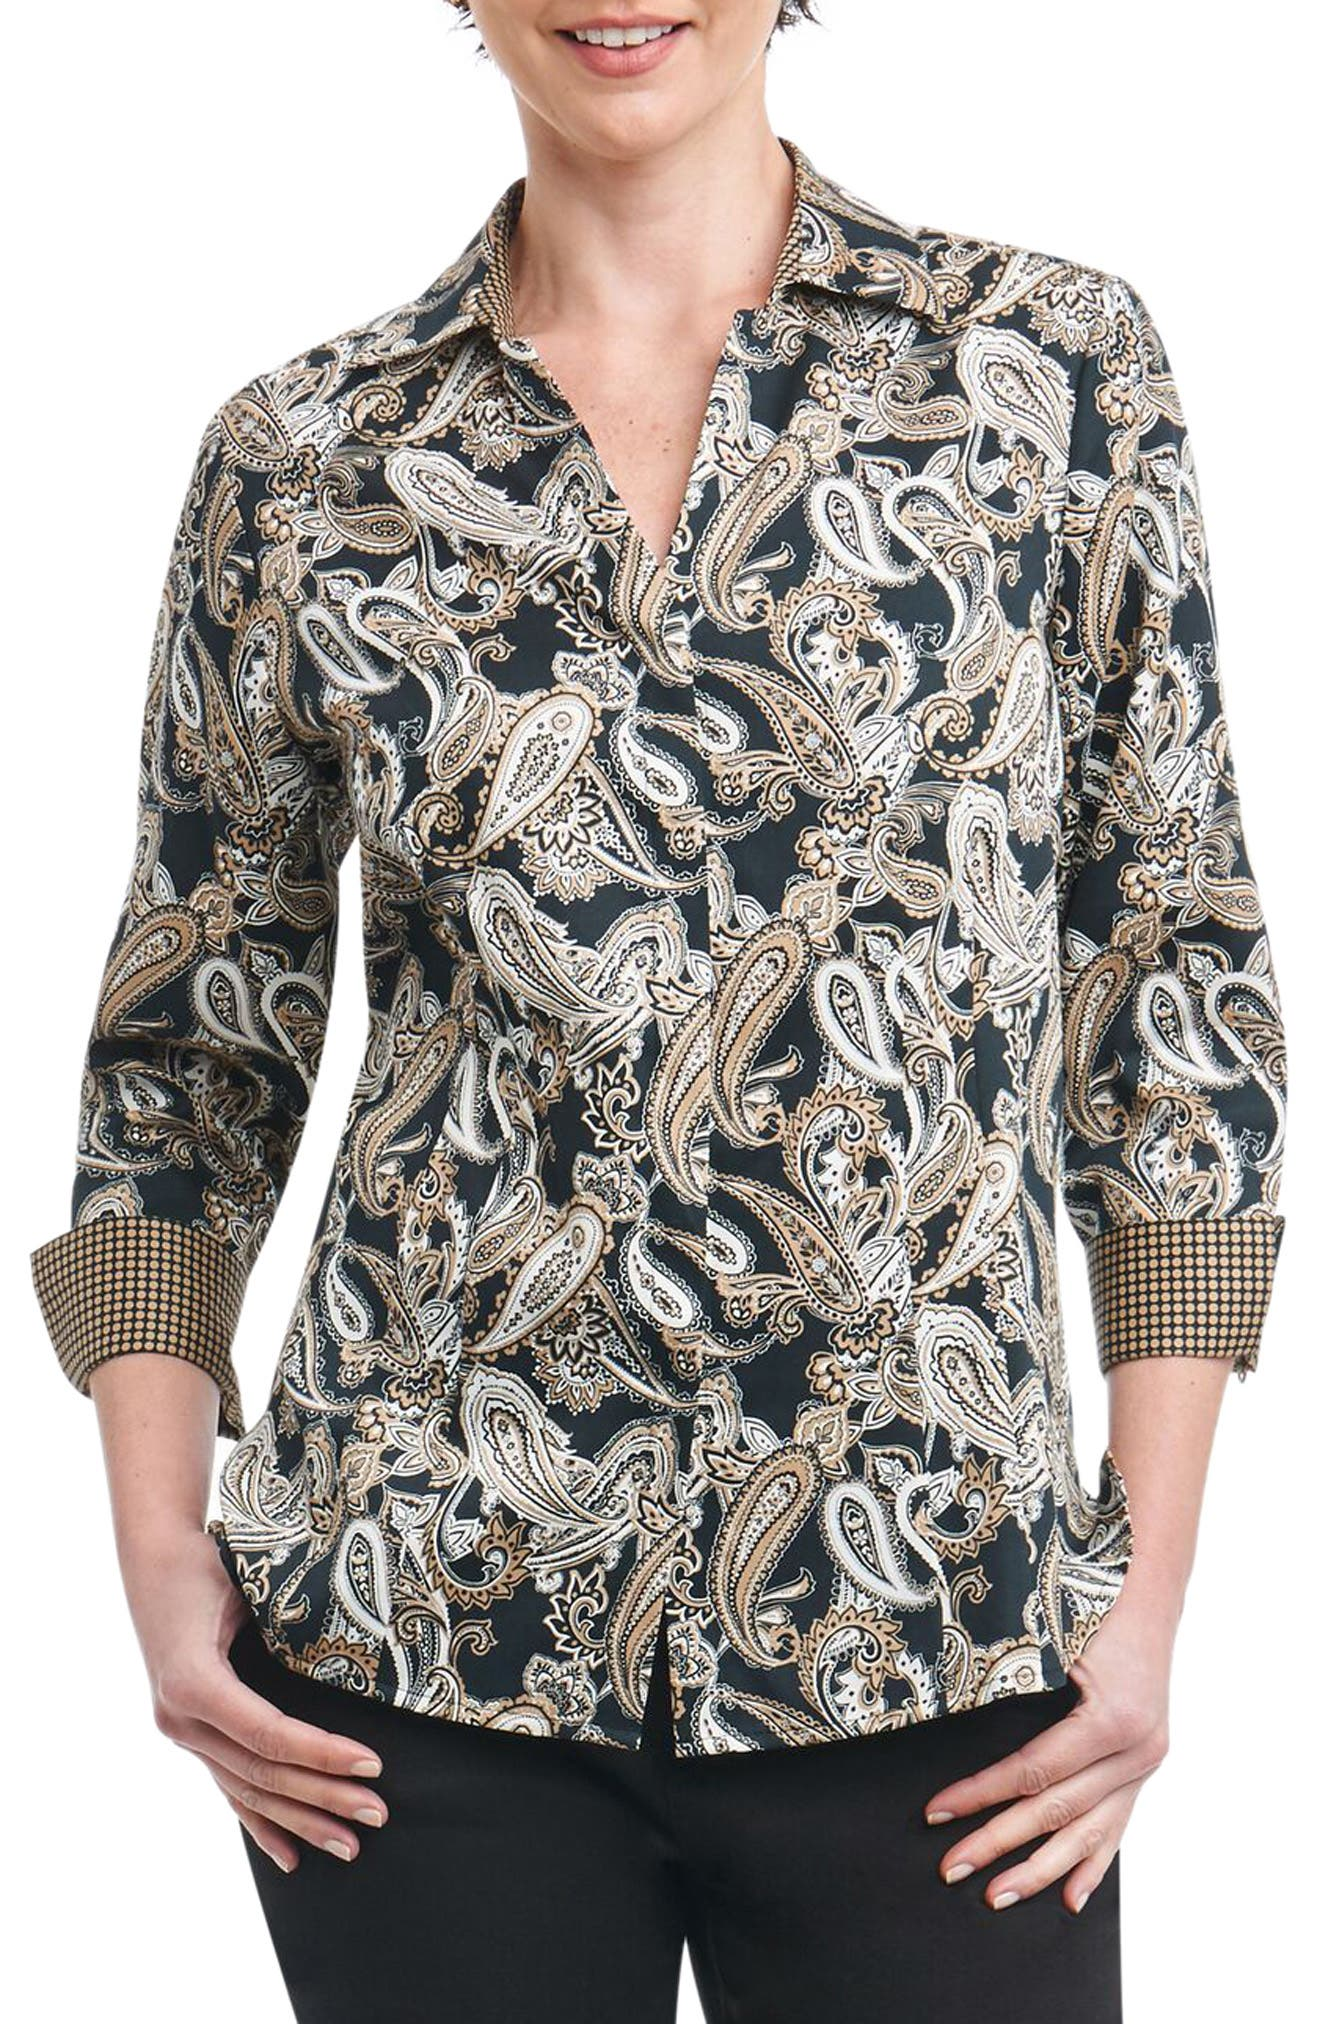 Taylor Heritage Paisley Wrinkle Free Shirt,                             Main thumbnail 1, color,                             002